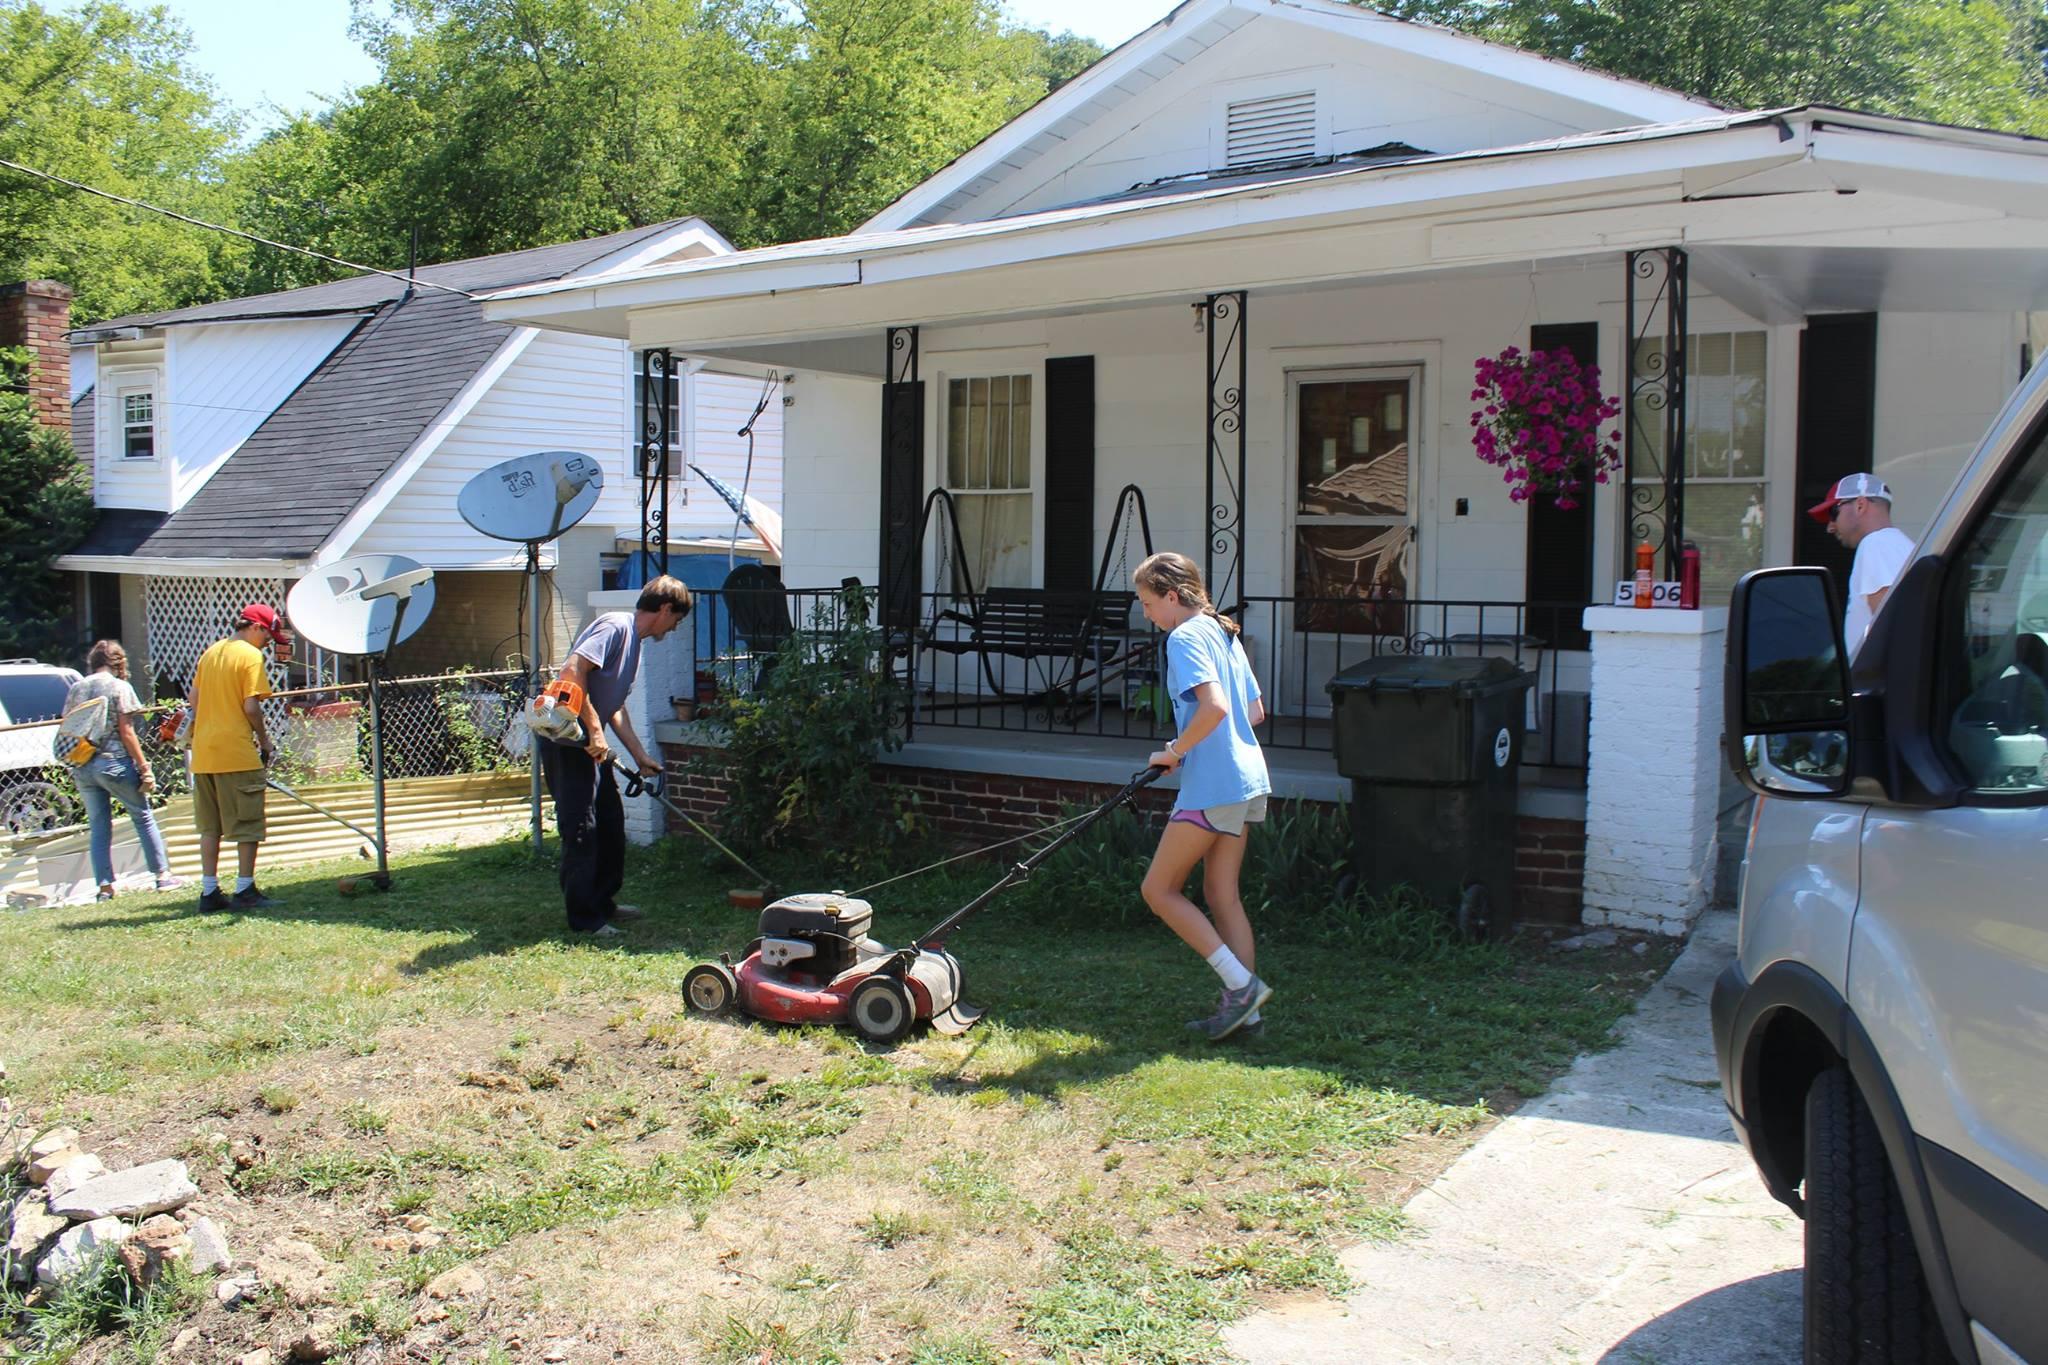 Chattanooga2016_06.29.16_WH_17.jpg